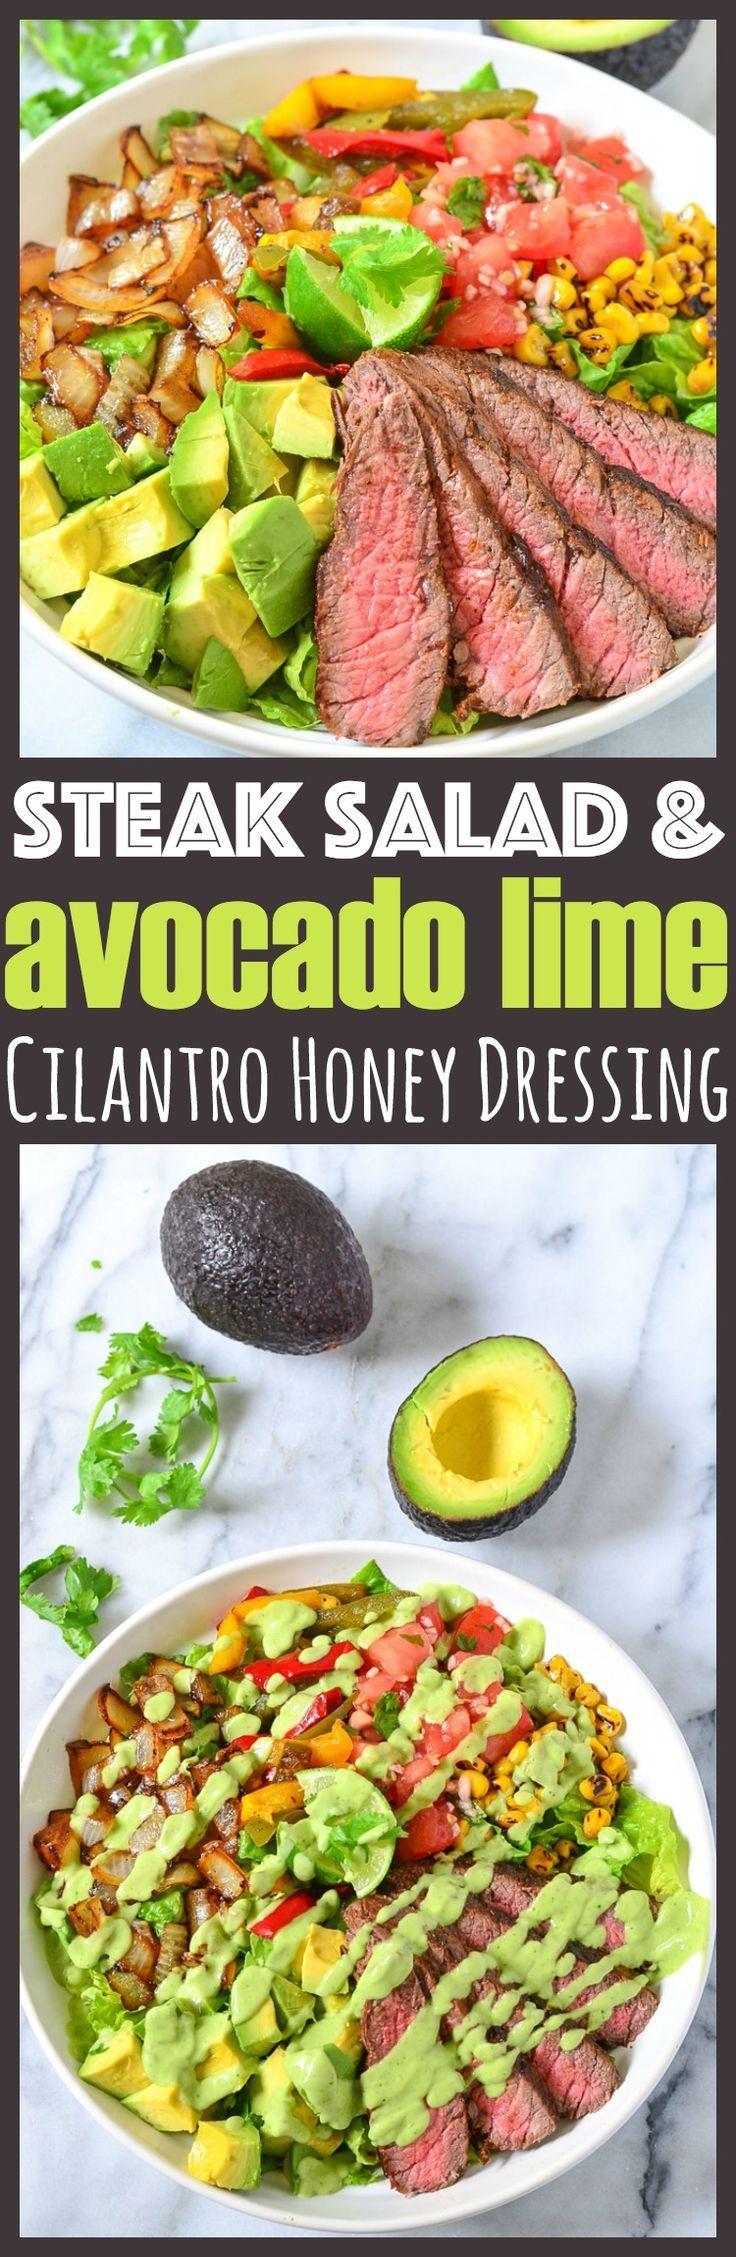 Avocado Steak Salad with Homemade Avocado Lime Cilantro Honey Dressing + how to pick the perfect avocado and remove the avocado pit without a knife! via @CourtneysSweets